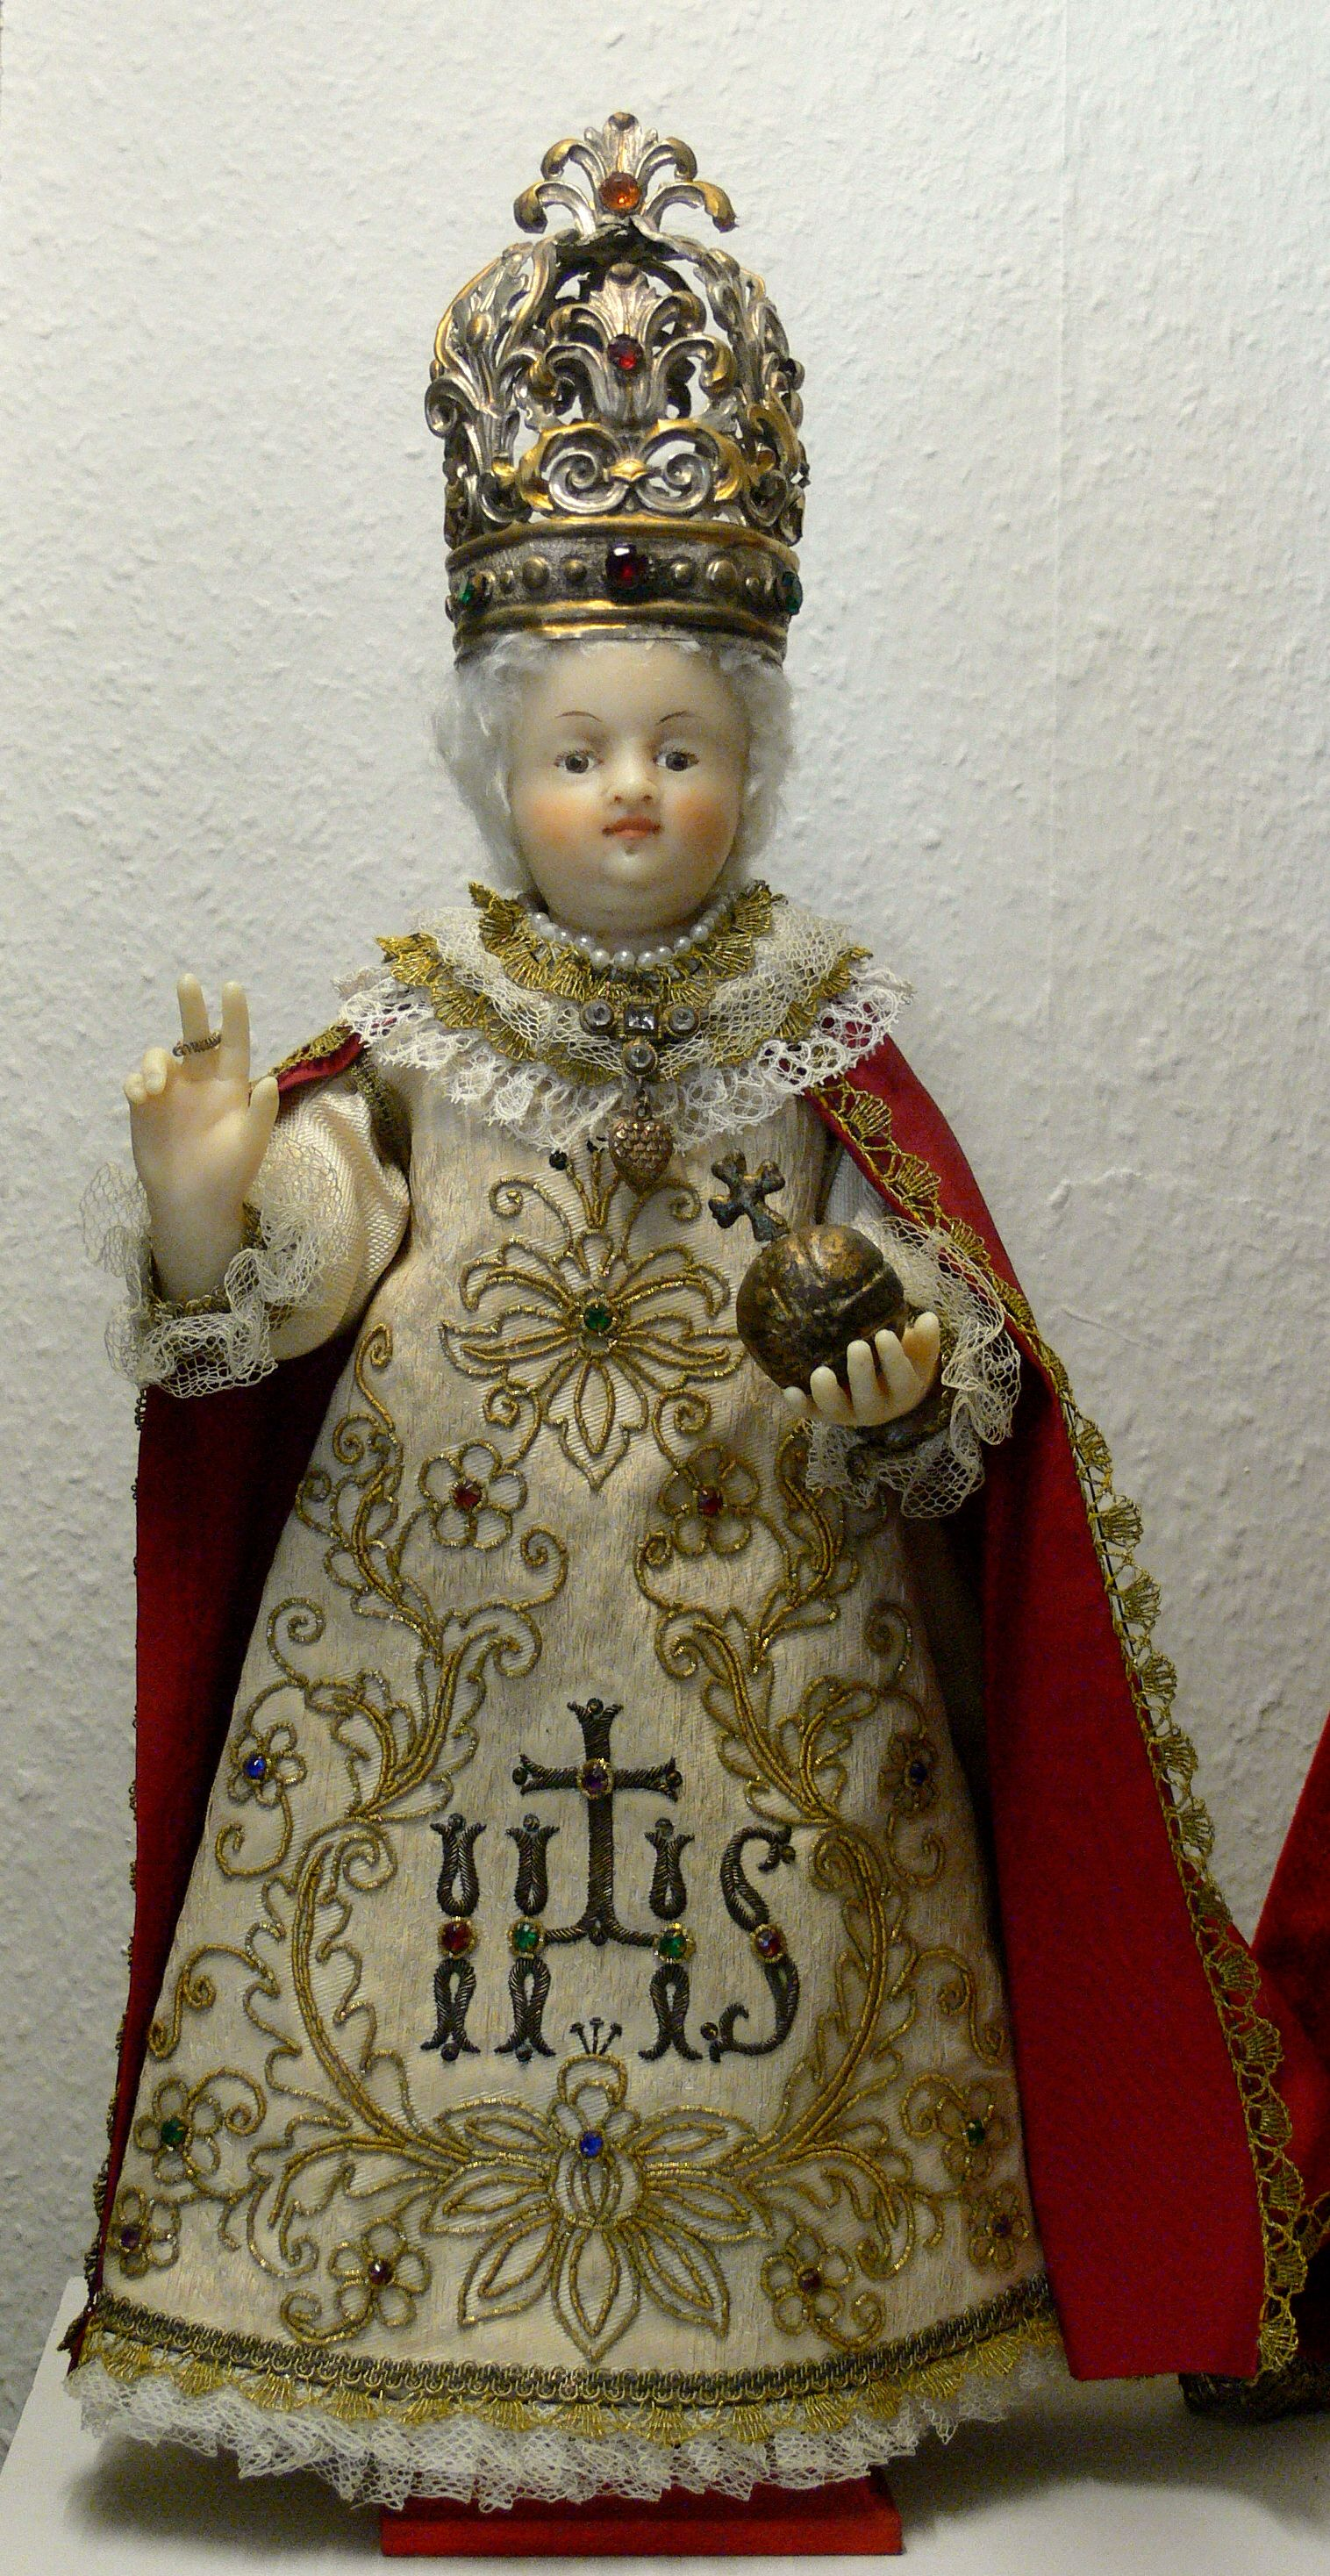 santo niño jesus baby jesus niño dios child god child jesus